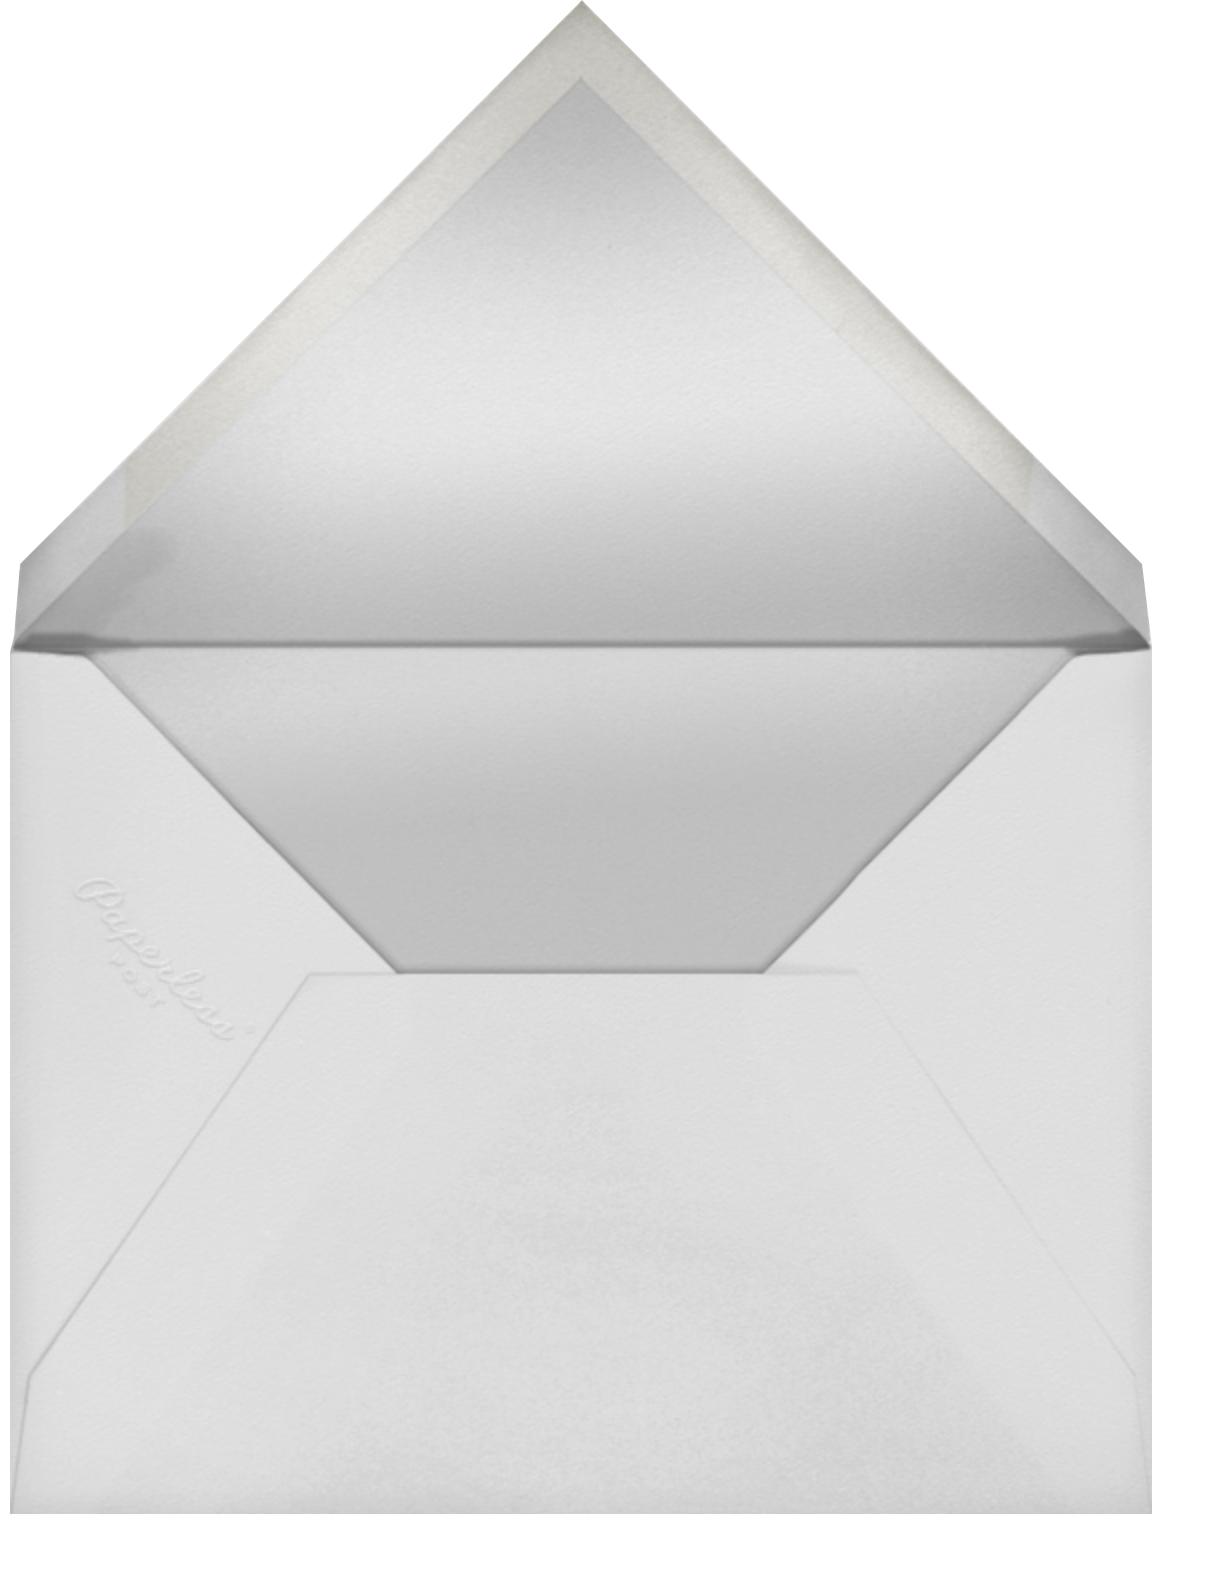 Sonora (Menu) - Paperless Post - Menus - envelope back